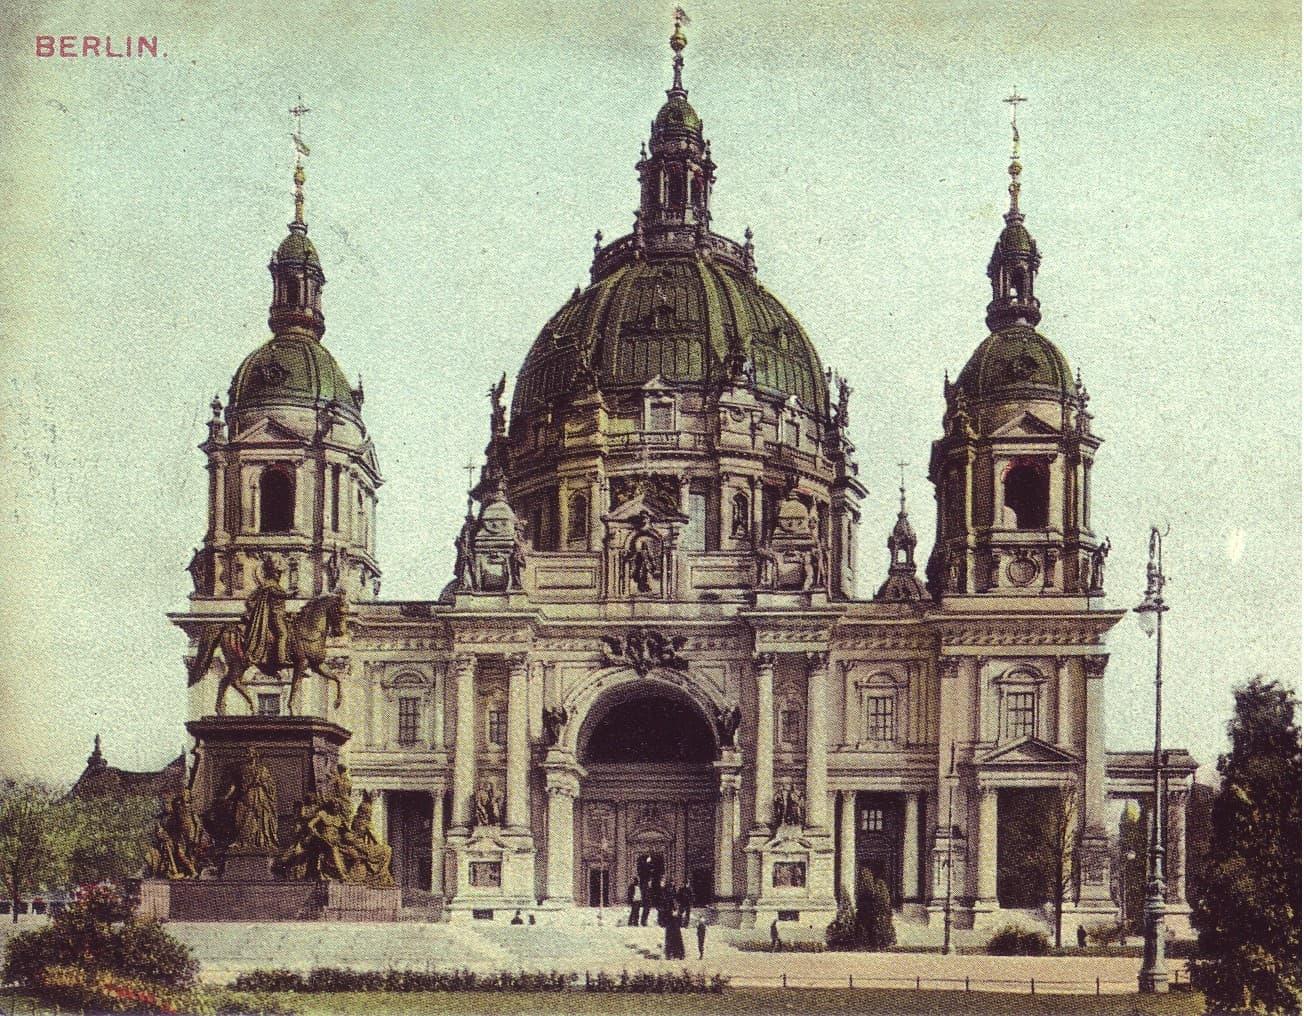 Postkarte vom Berliner Dom 1900